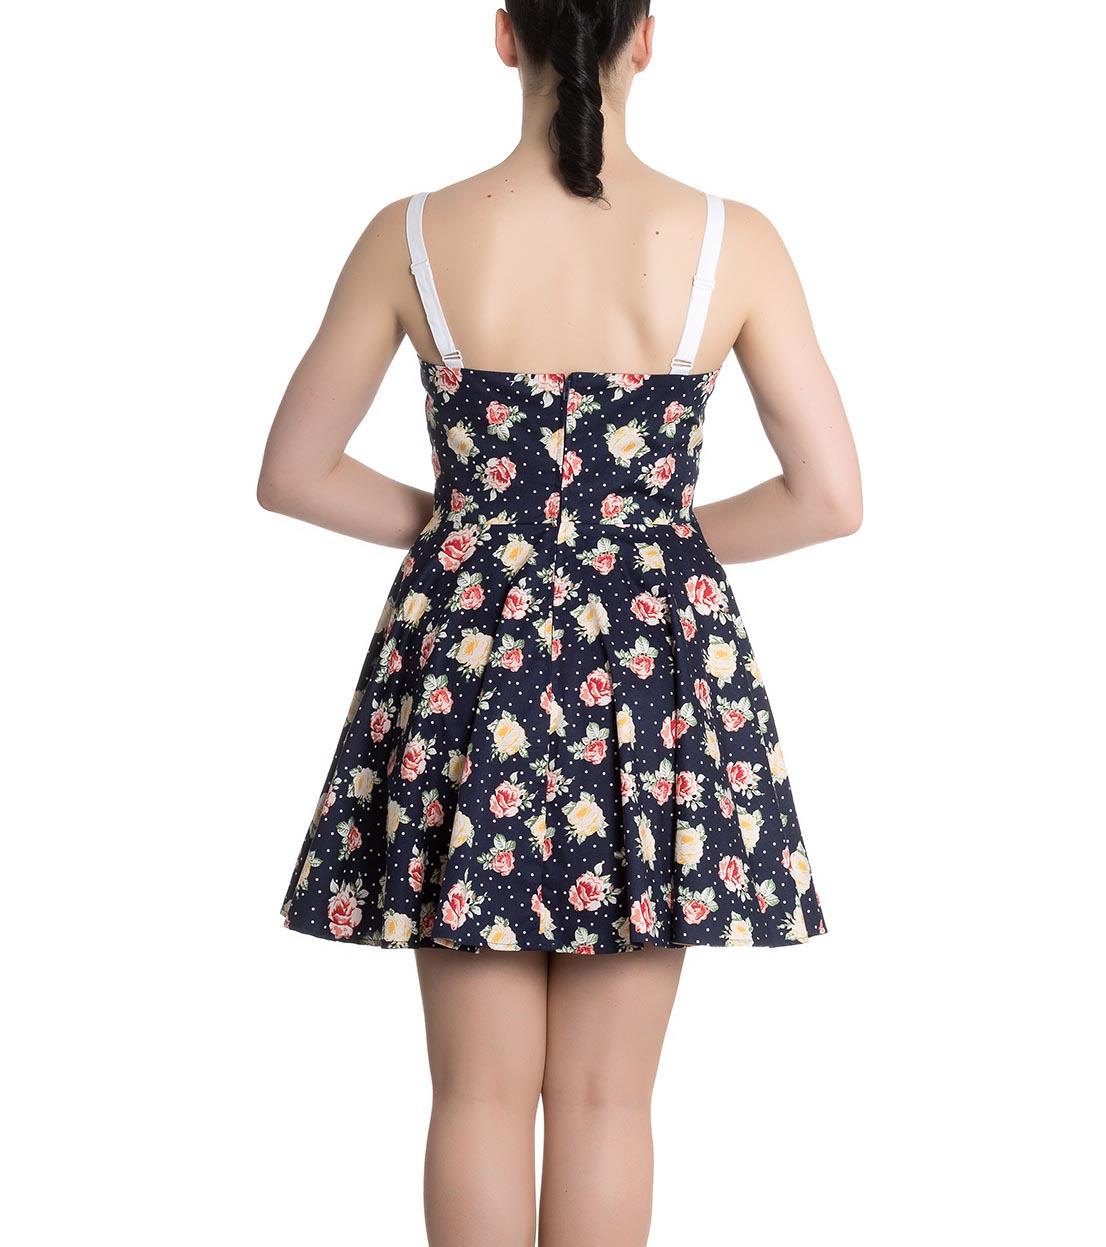 Hell-Bunny-Navy-Blue-Floral-Roses-Flowers-Mini-Dress-EMMA-Polka-Dot-All-Sizes thumbnail 5